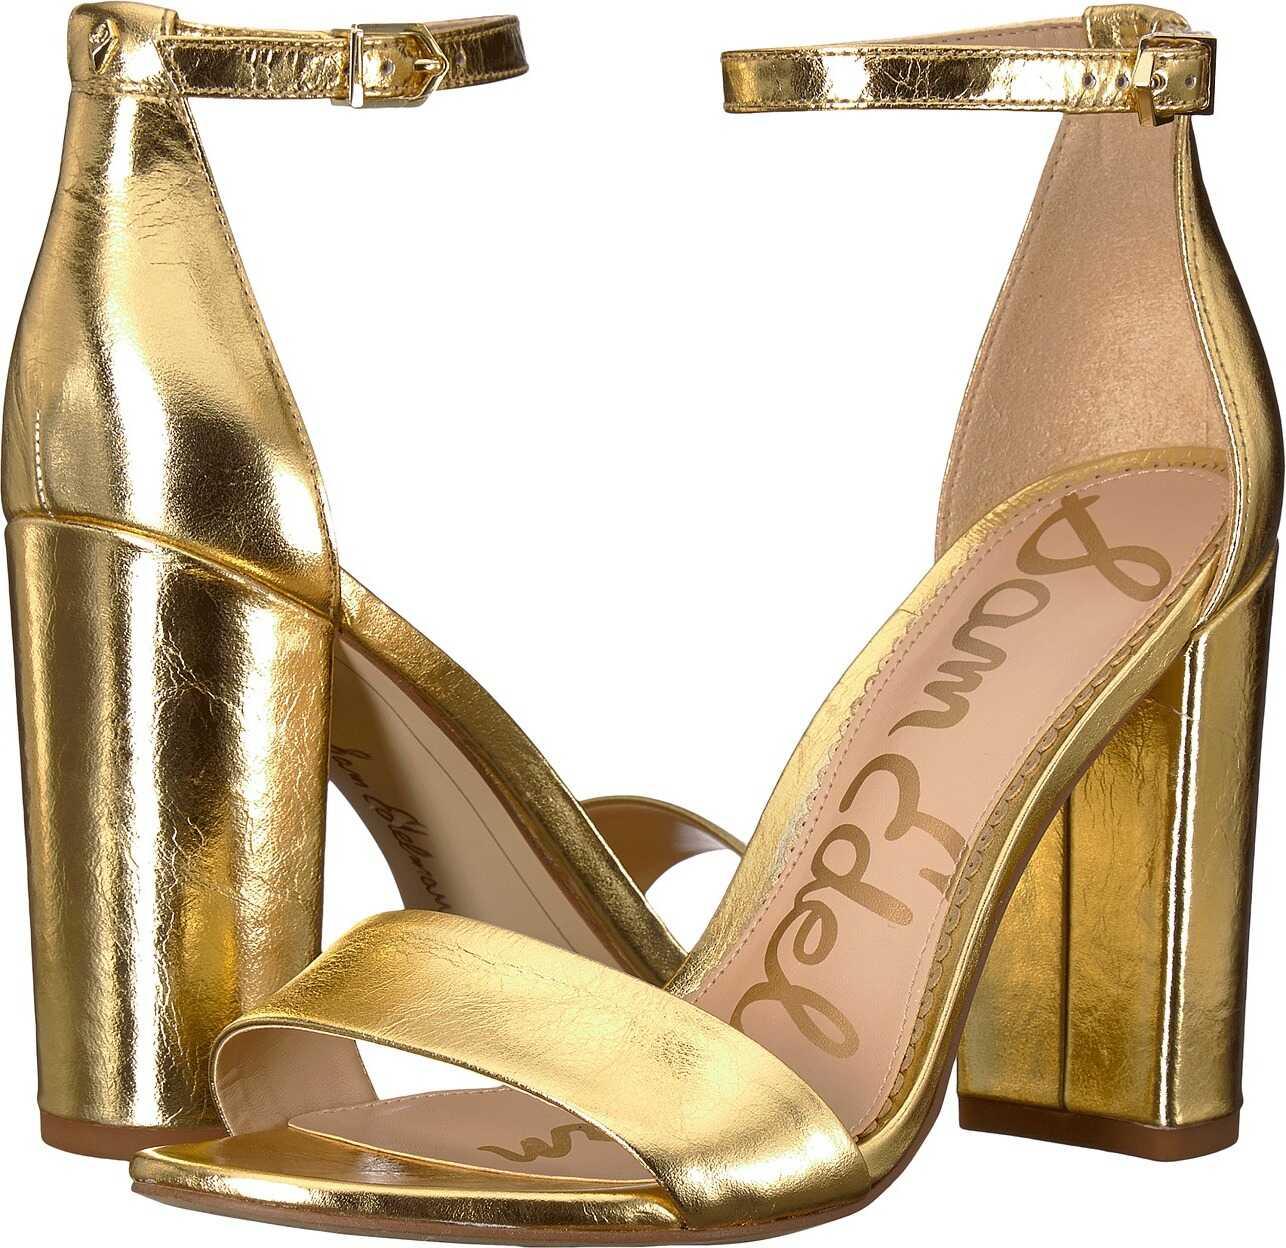 Sam Edelman Yaro Ankle Strap Sandal Heel Bright Gold Distressed Metallic Leather